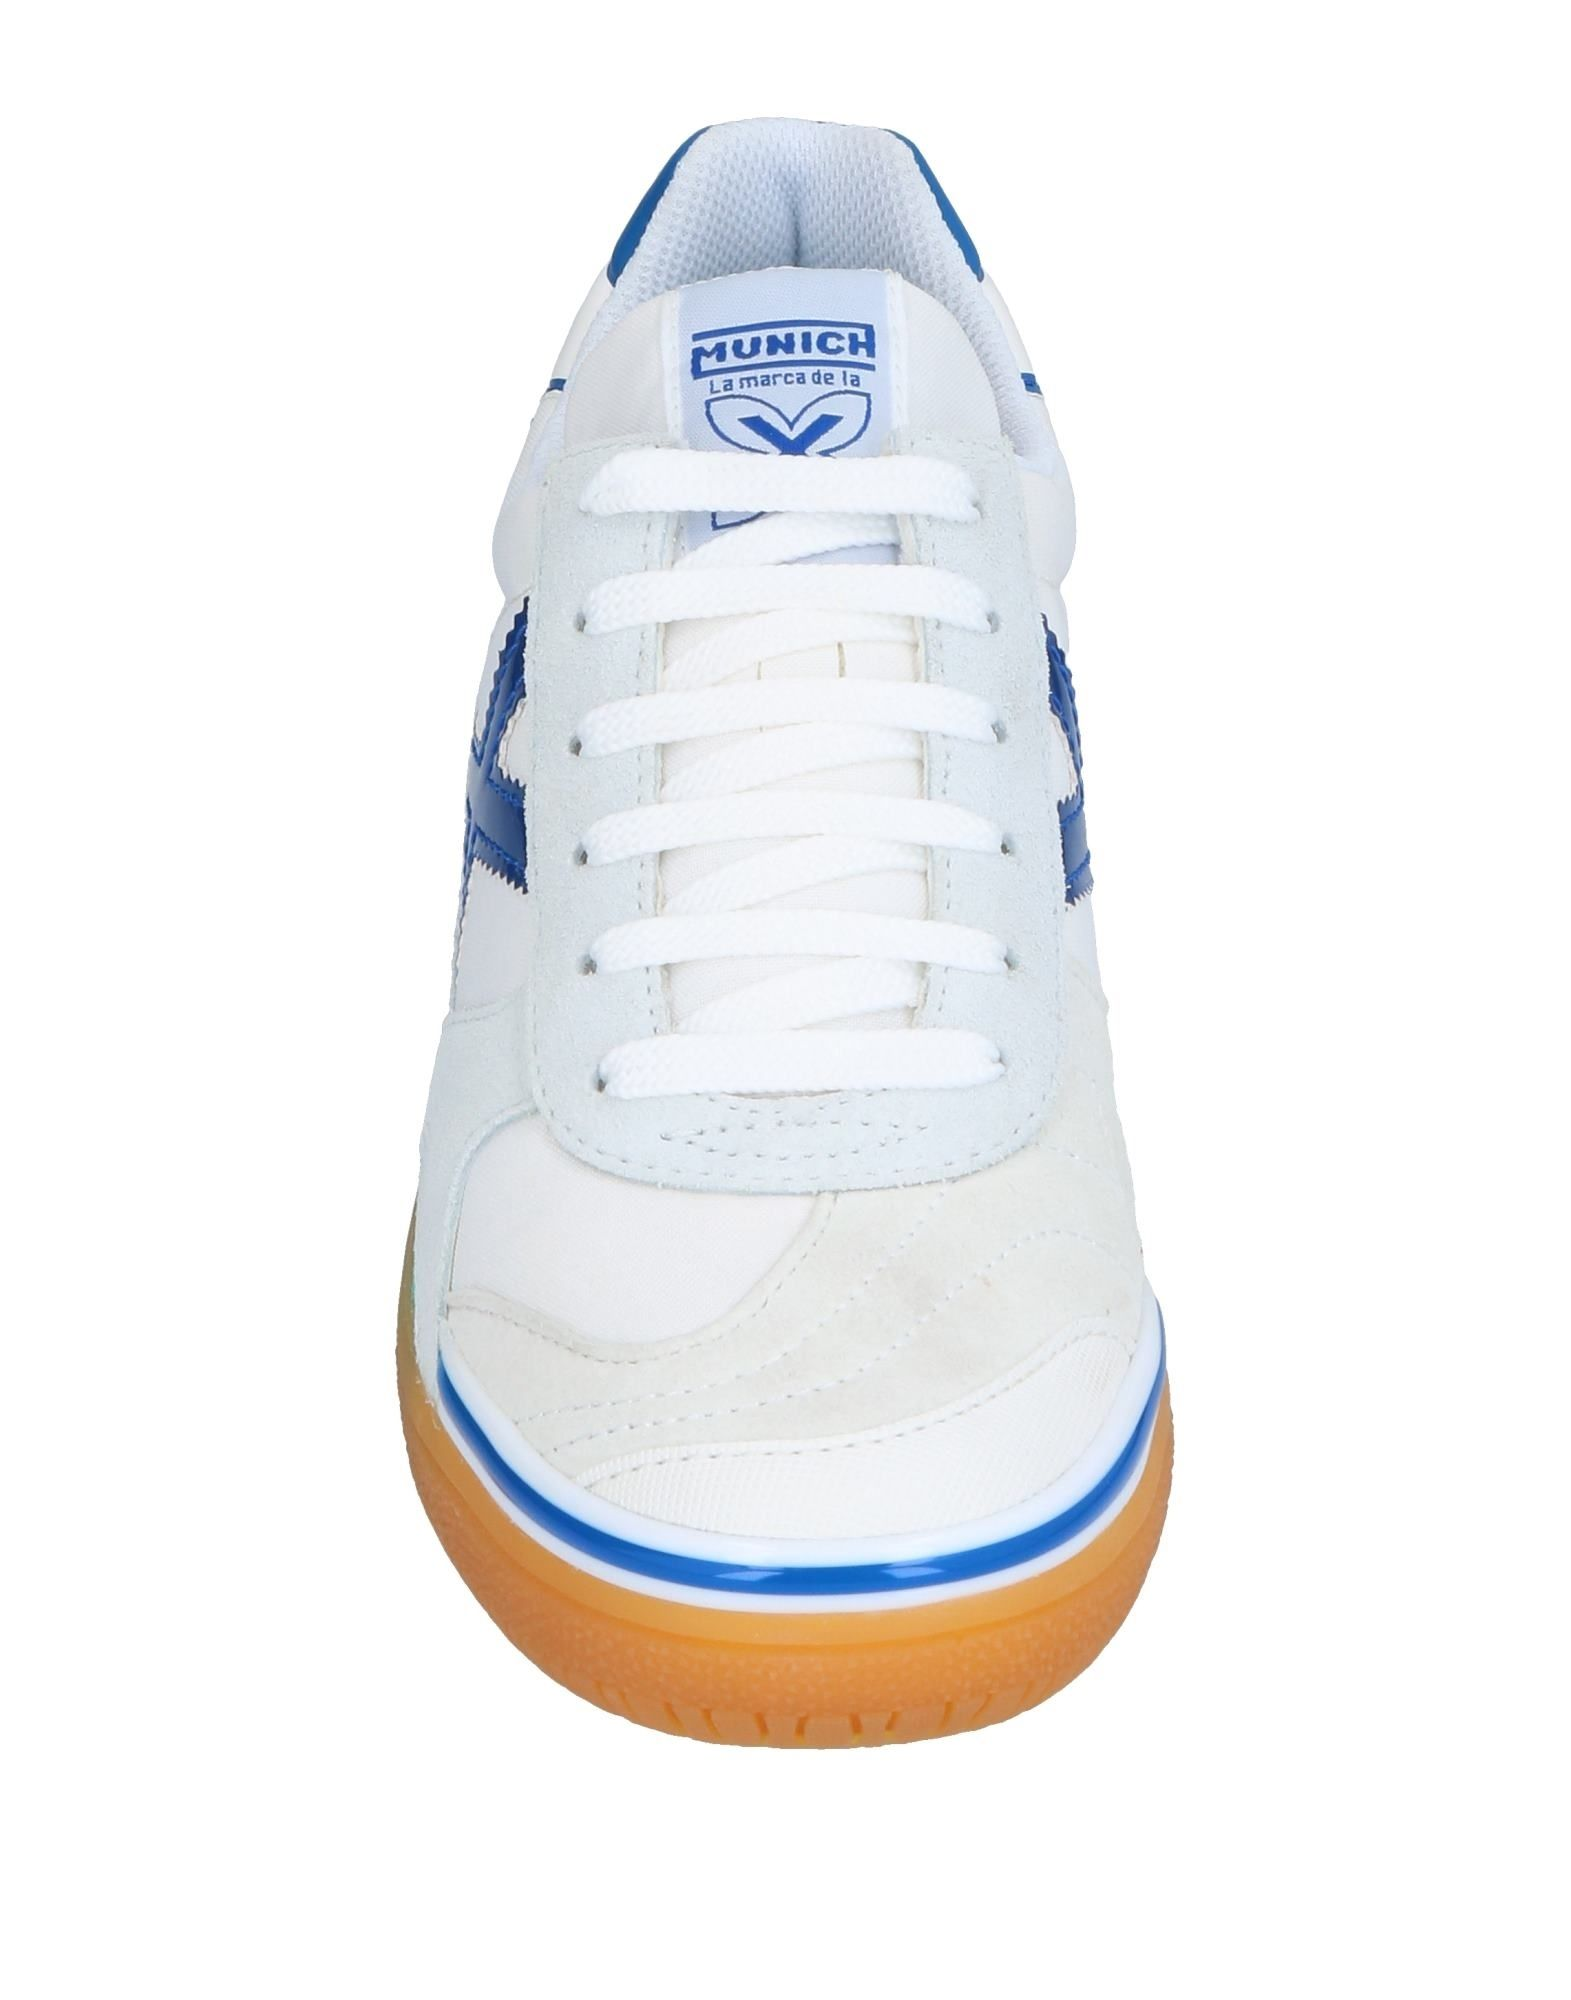 Munich Sneakers Herren  11412650MV Heiße Schuhe 0662fd